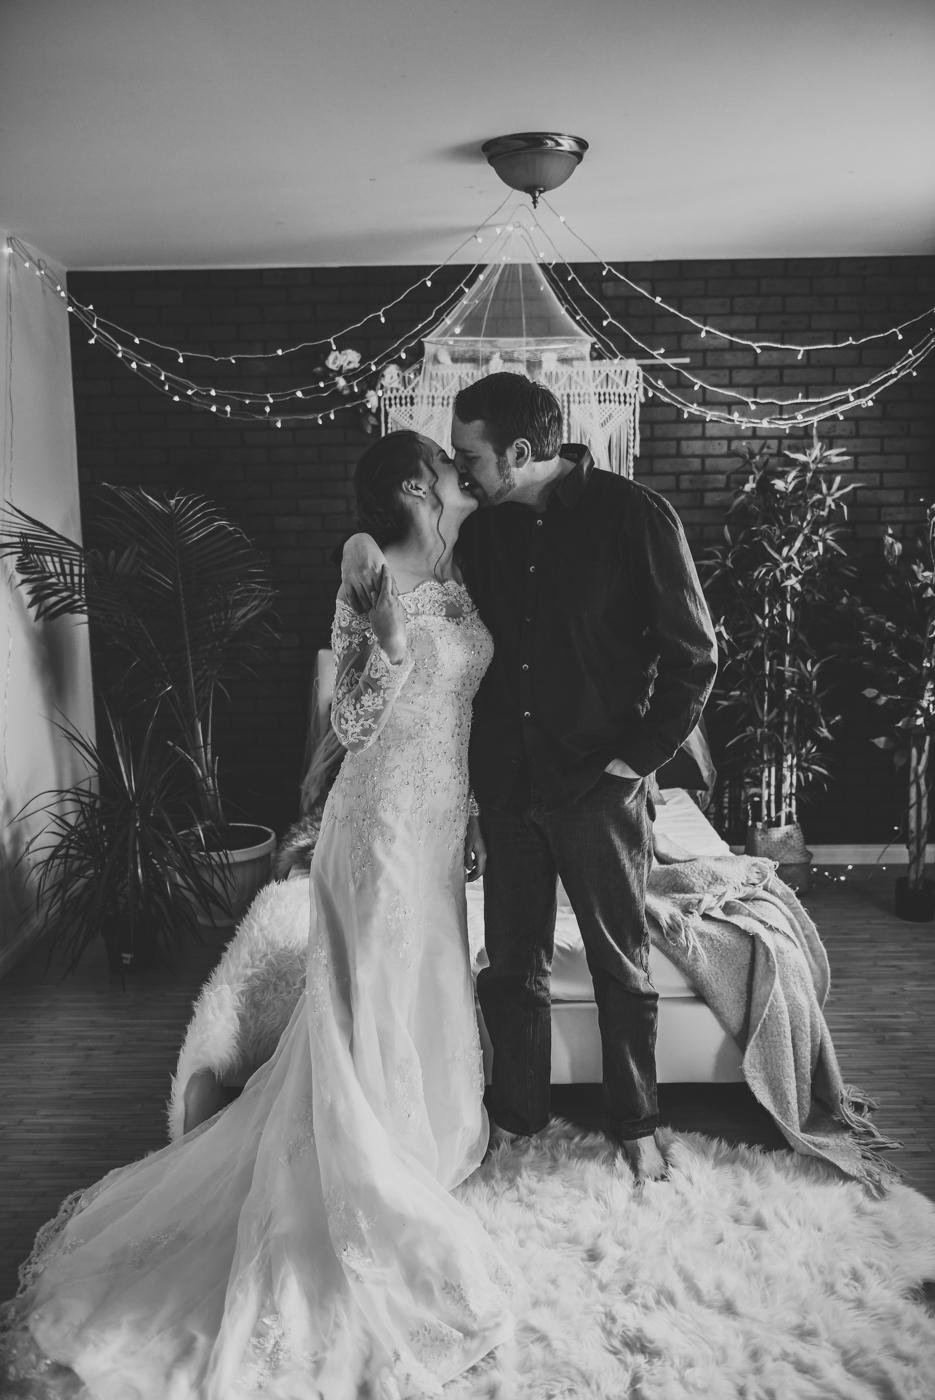 FortSt.John_photographer_TyraEPhotography_Wedding_Couple_Family_Photograhy_DawsonCreek_Elopement_Bride_Boduoir_Portraits-9.jpg